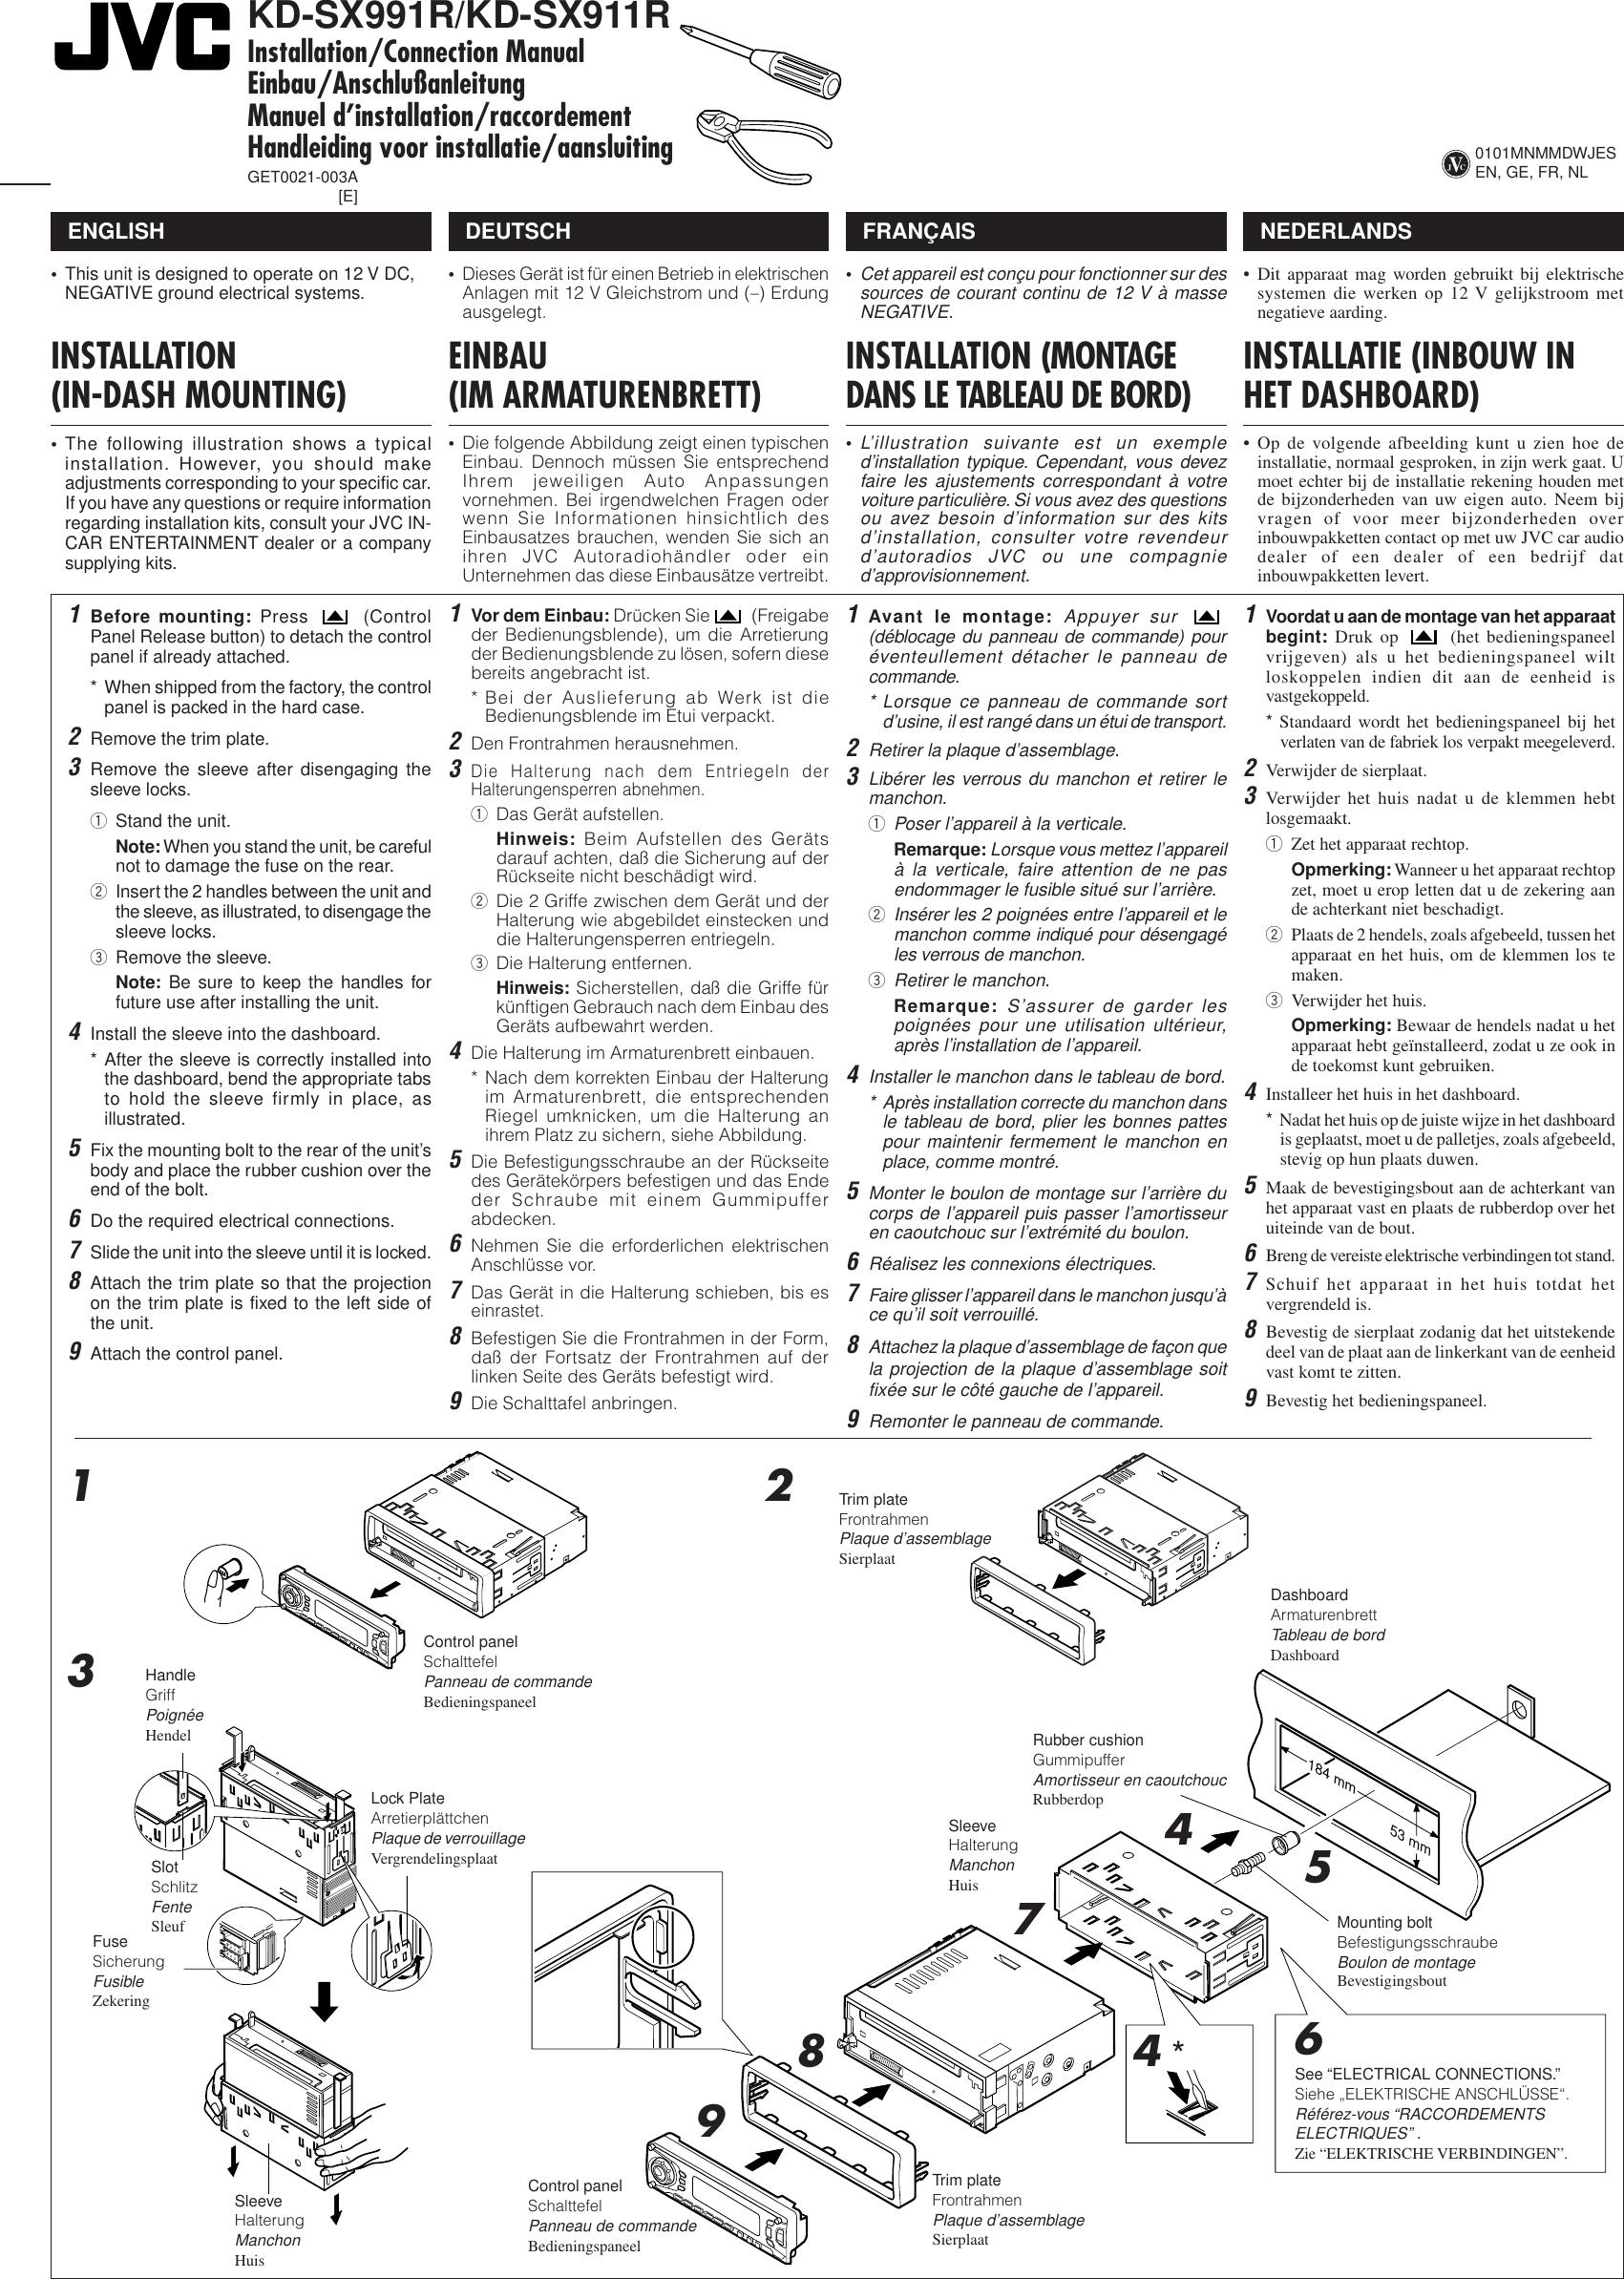 JVC KD SX911R SX991R/KD User Manual SX911R, SX991R GET0021 003A